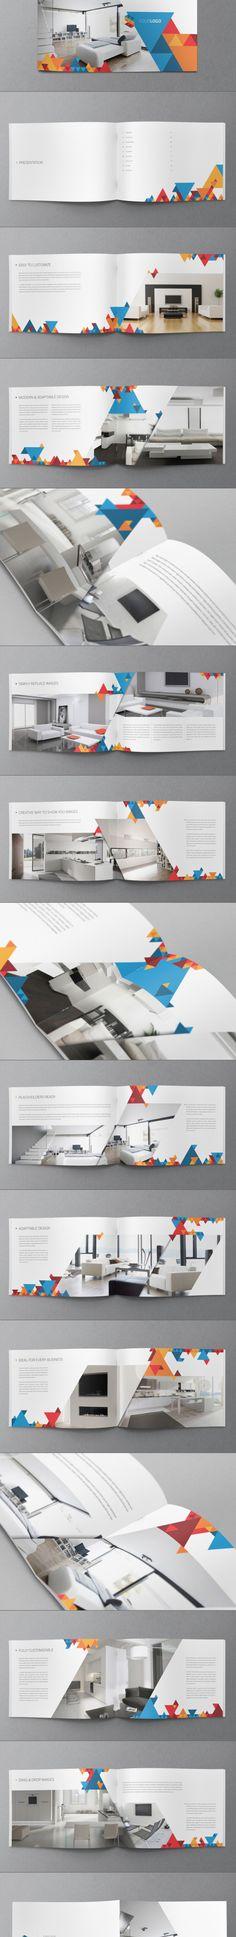 45+ Free Brochure Templates PSD Download | BlogSizzle